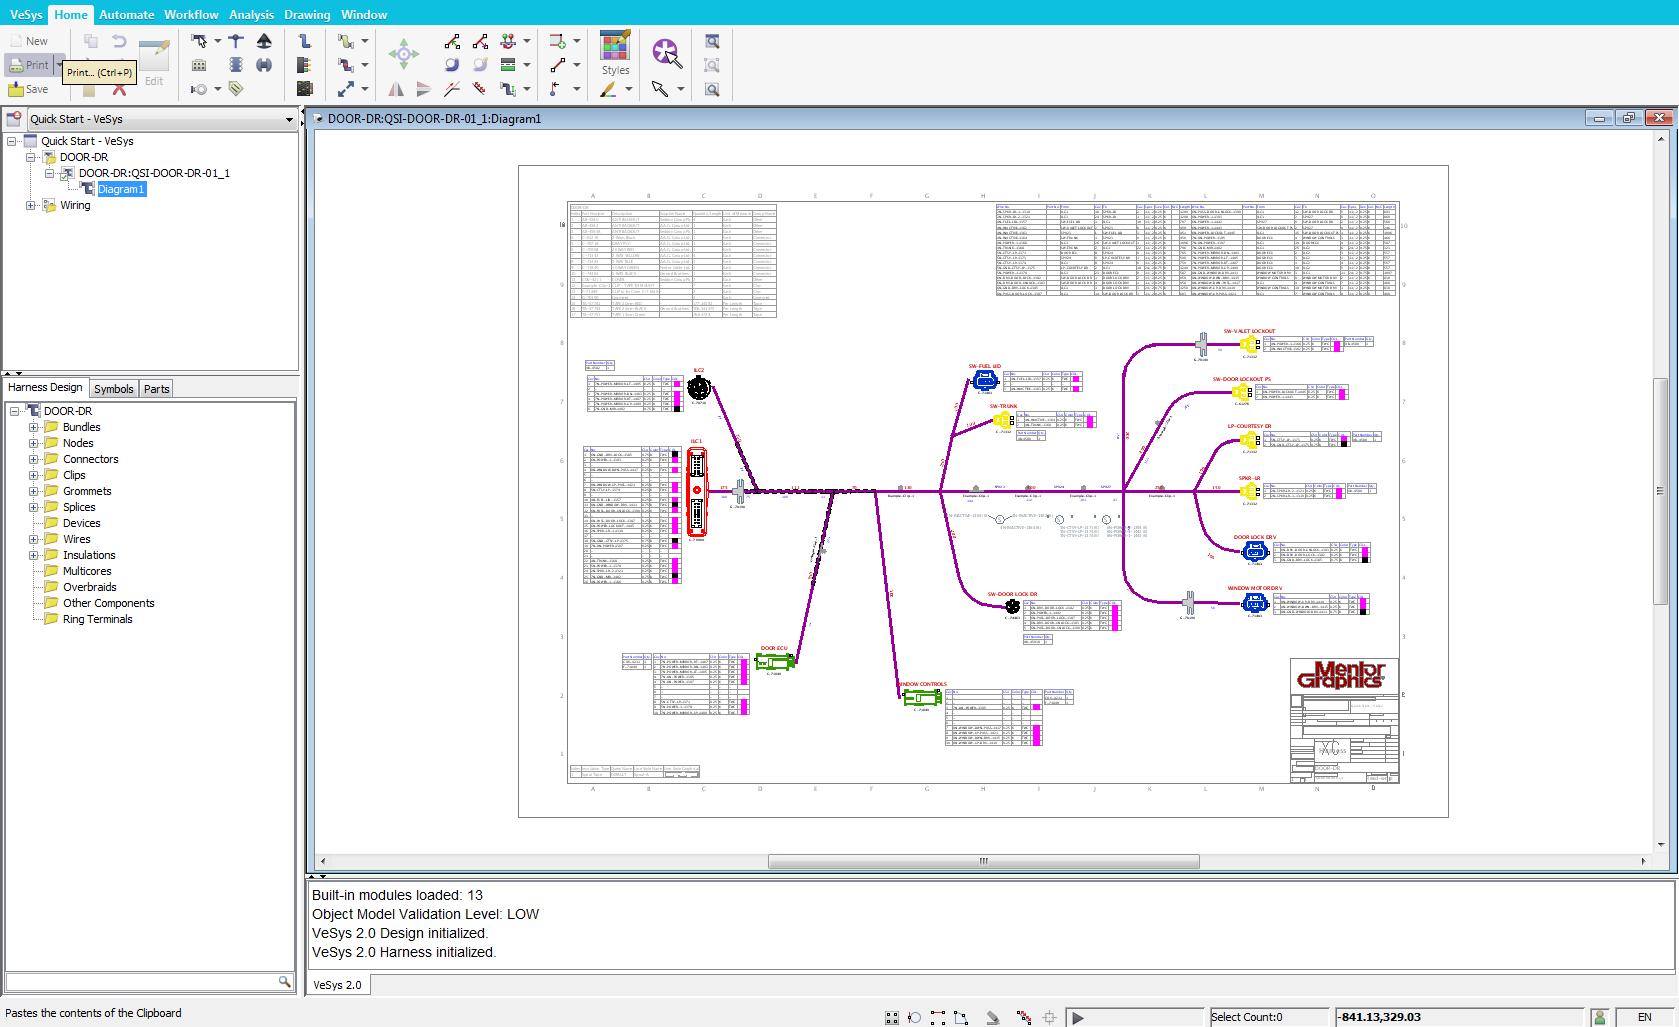 vesysharness E25D6D80?q=80&w=1600&fit=max vesys harness mentor graphics wire harness designer jobs at creativeand.co